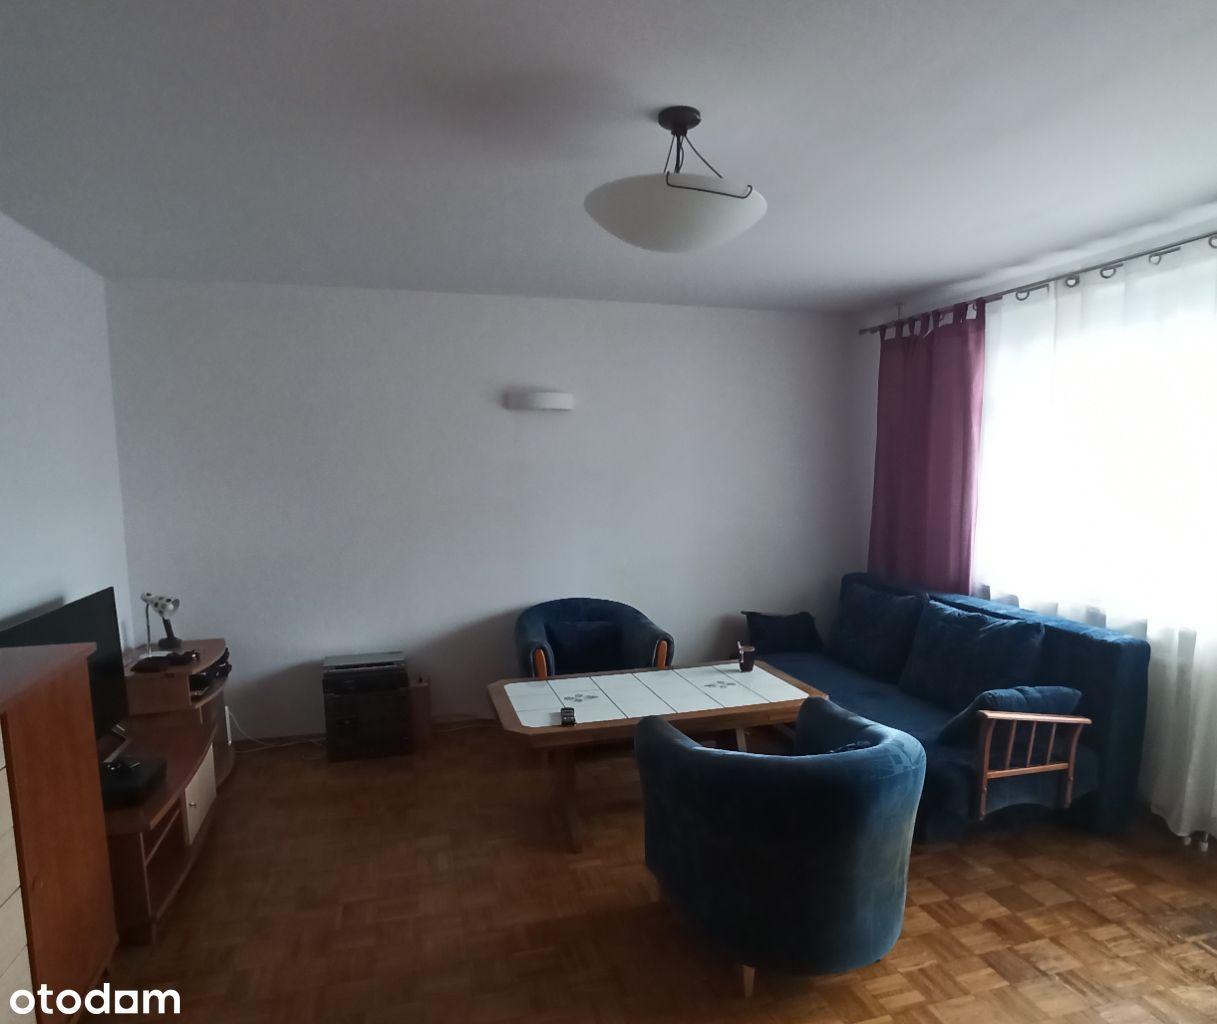 Mieszkanie 59,4 m2, I piętro